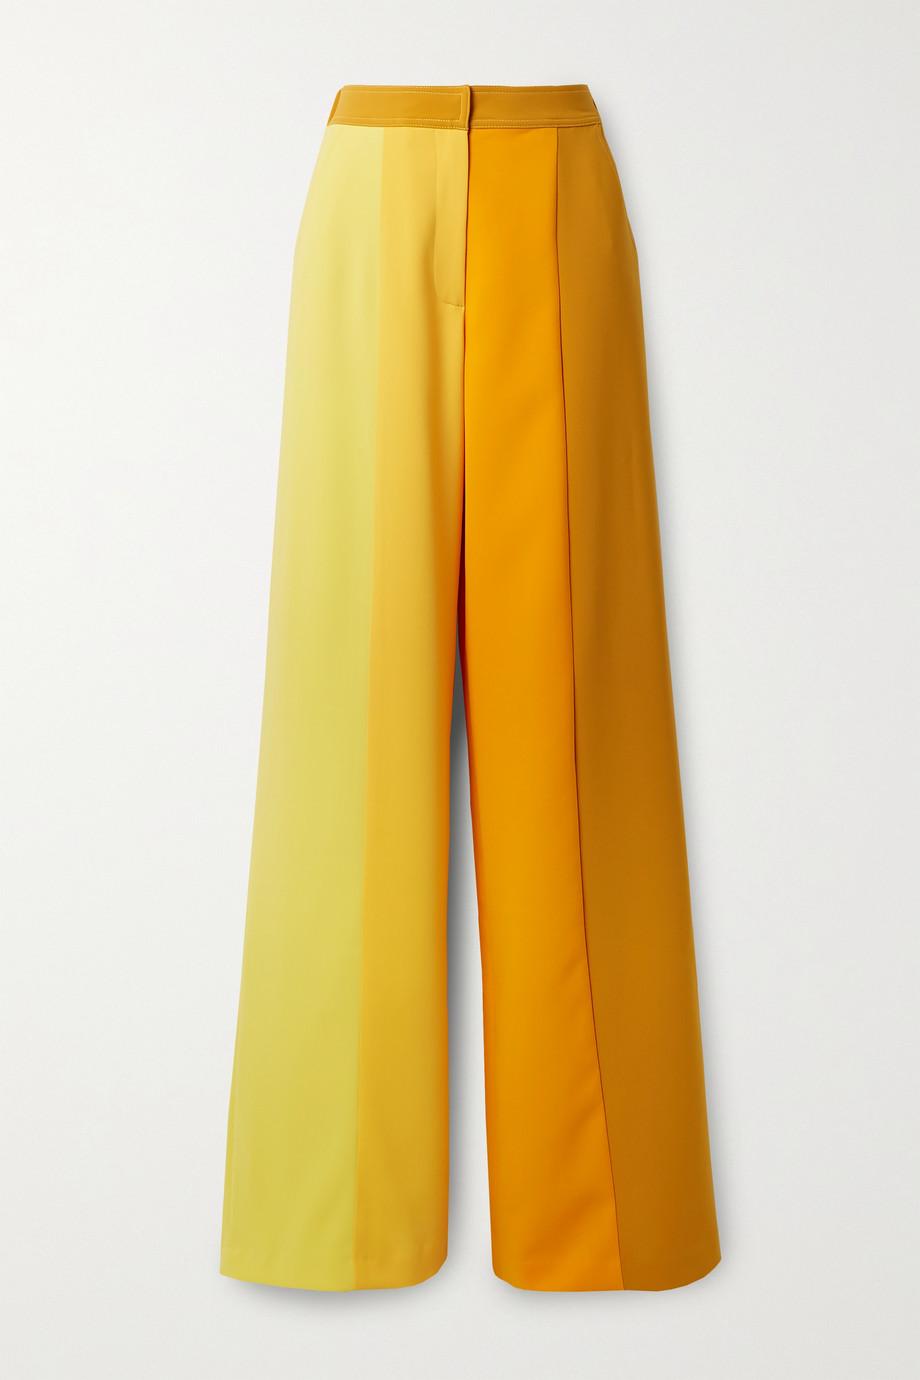 Christopher John Rogers Hose mit weitem Bein aus Stretch-Crêpe in Colour-Block-Optik